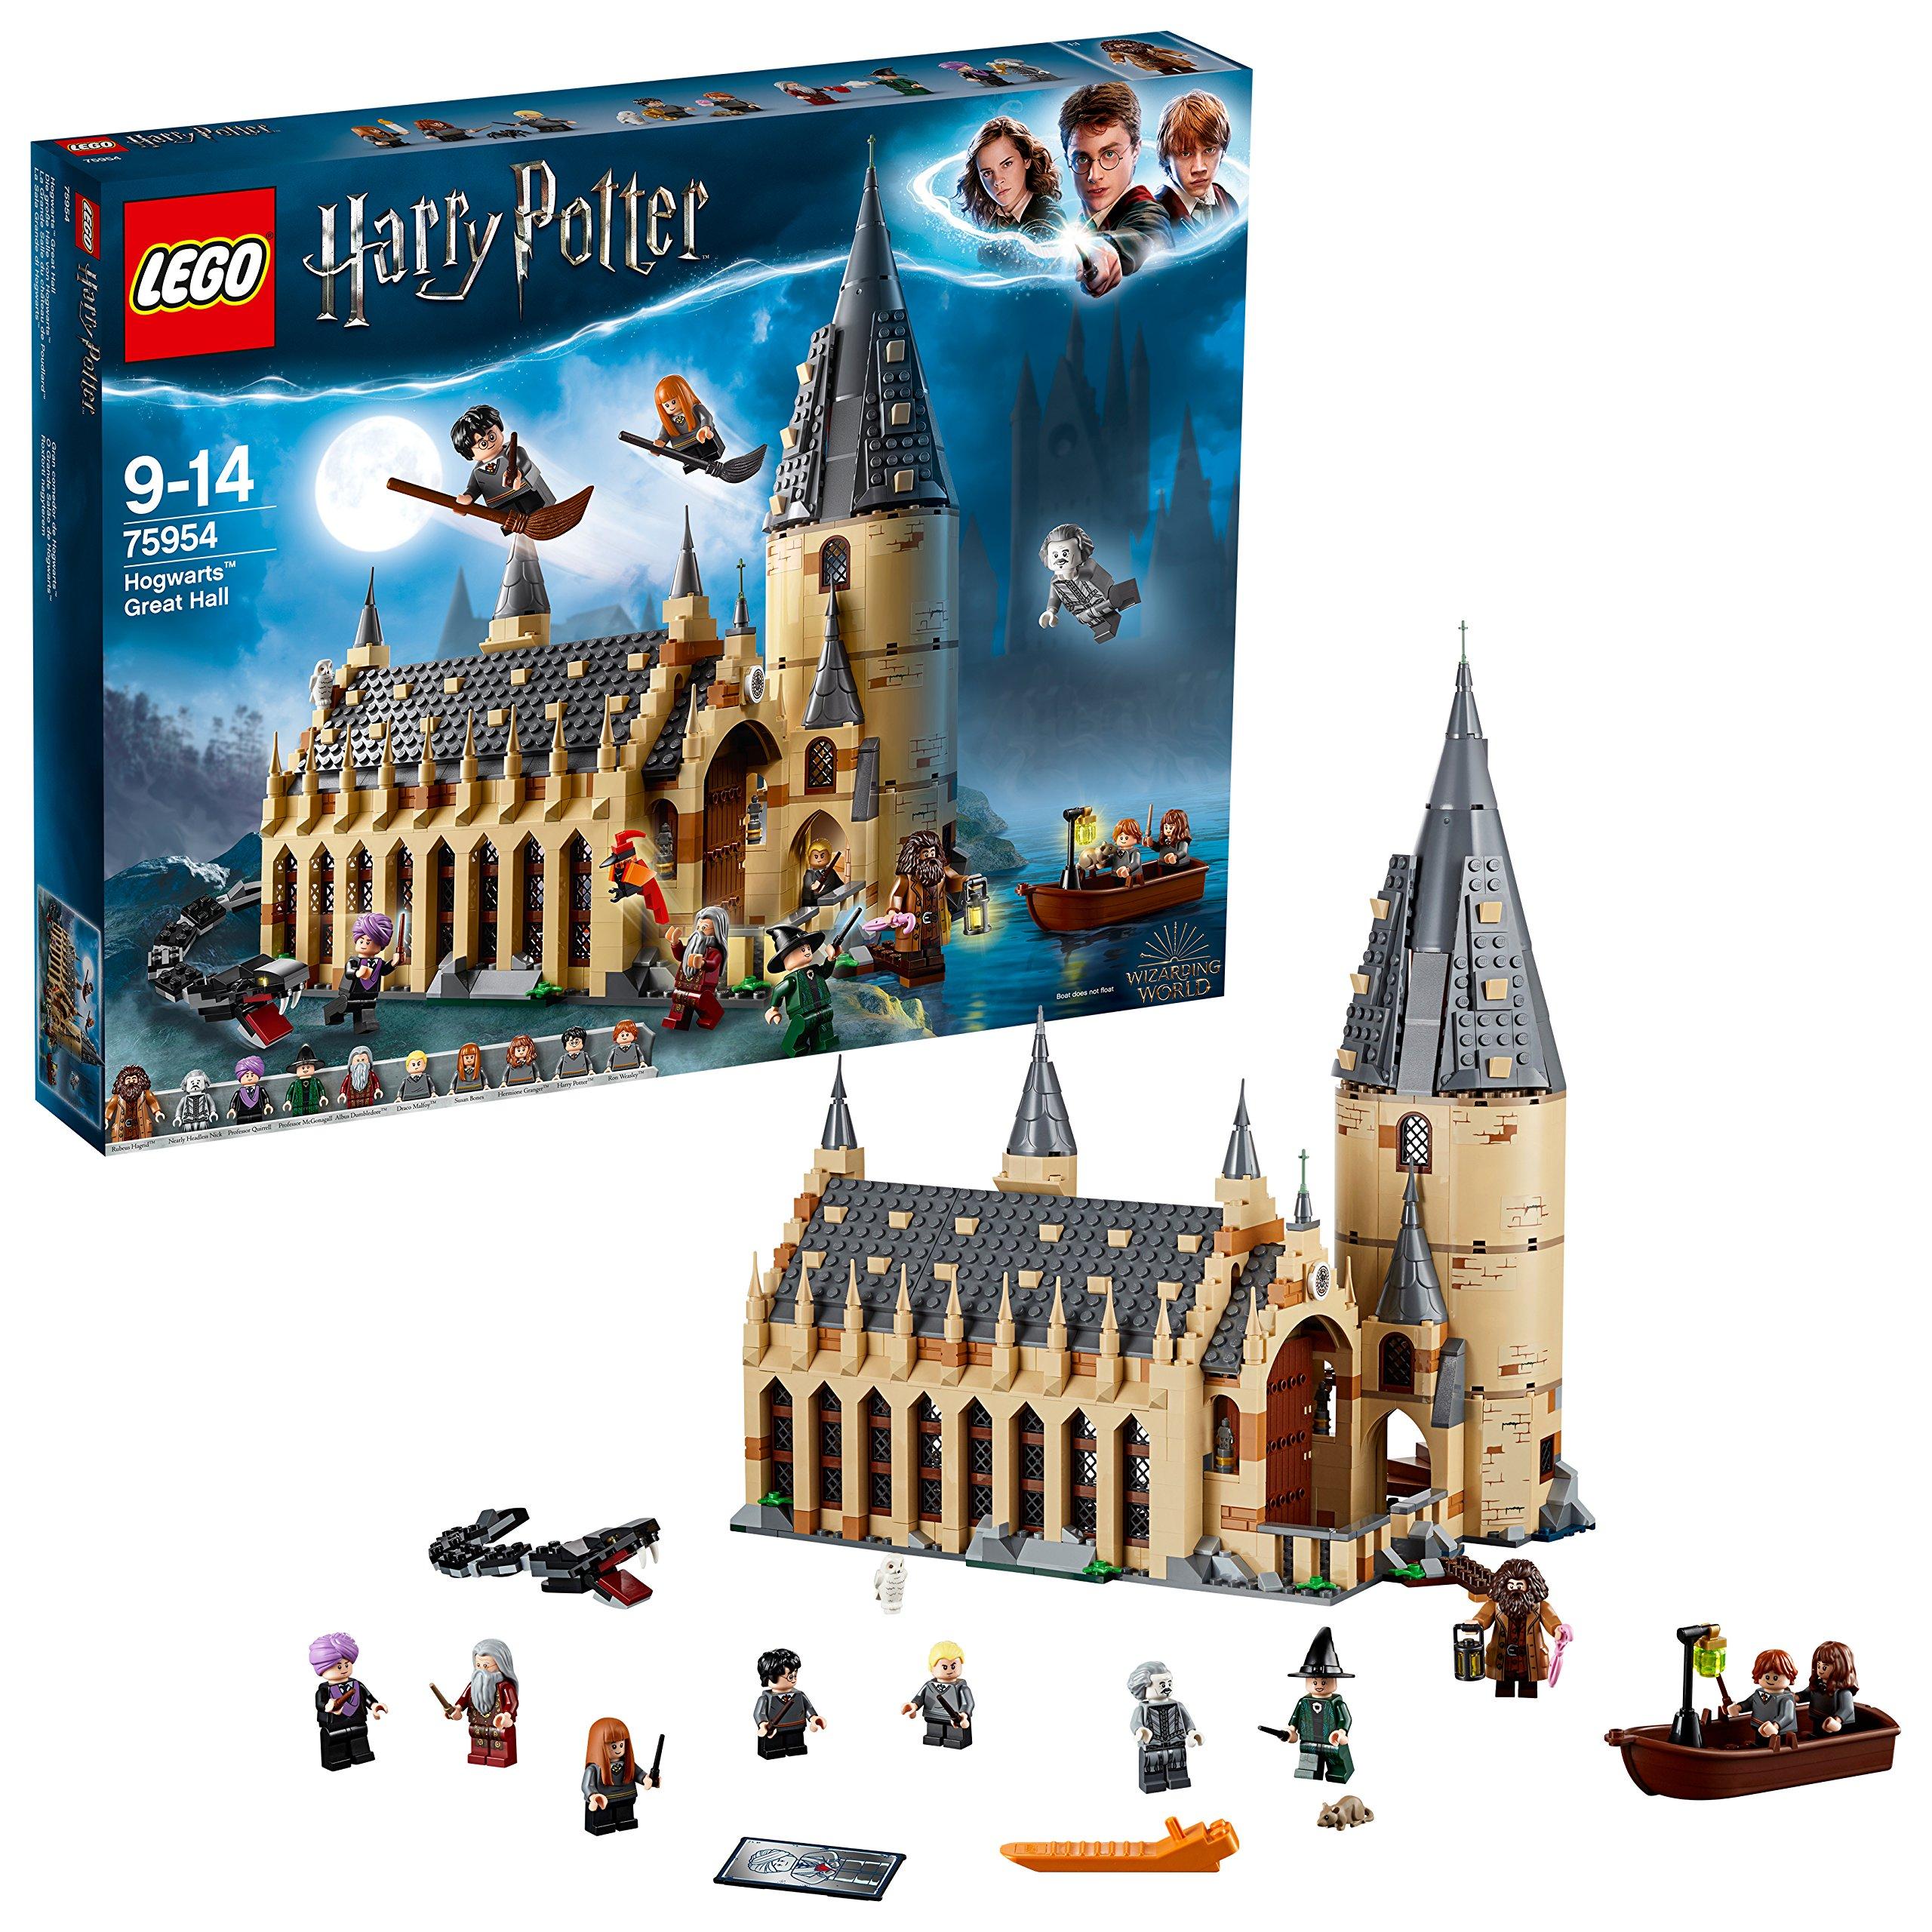 LEGO 75954 Harry Potter Gran Comedor de Hogwarts – Juguete de Construcción, con Minifiguras de Harry Potter